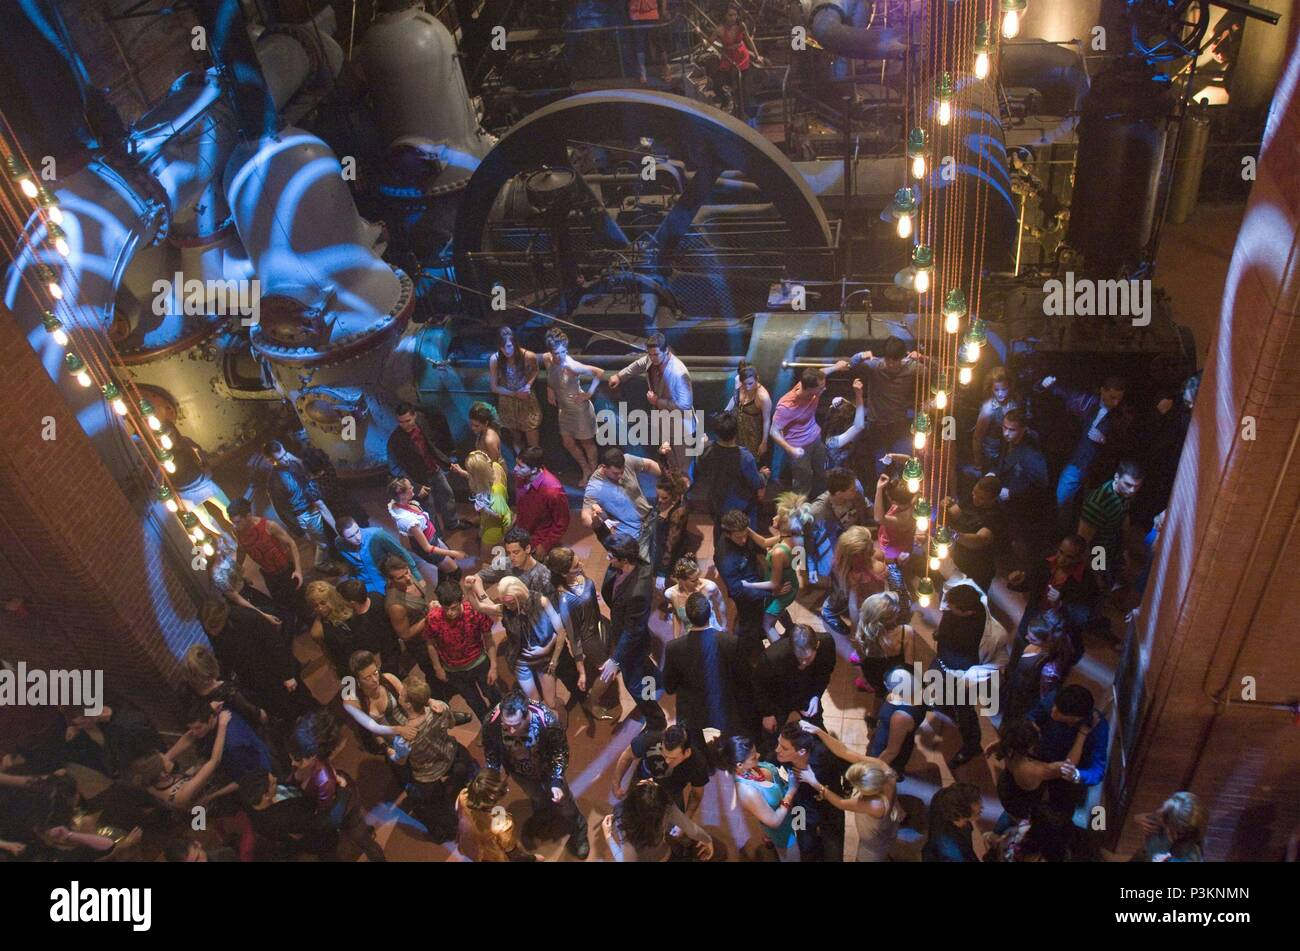 Original Film Title: SURROGATES.  English Title: SURROGATES.  Film Director: JONATHAN MOSTOW.  Year: 2009. Credit: TOUCHSTONE PICTURES / VAUGHAN, STEPHEN / Album Stock Photo